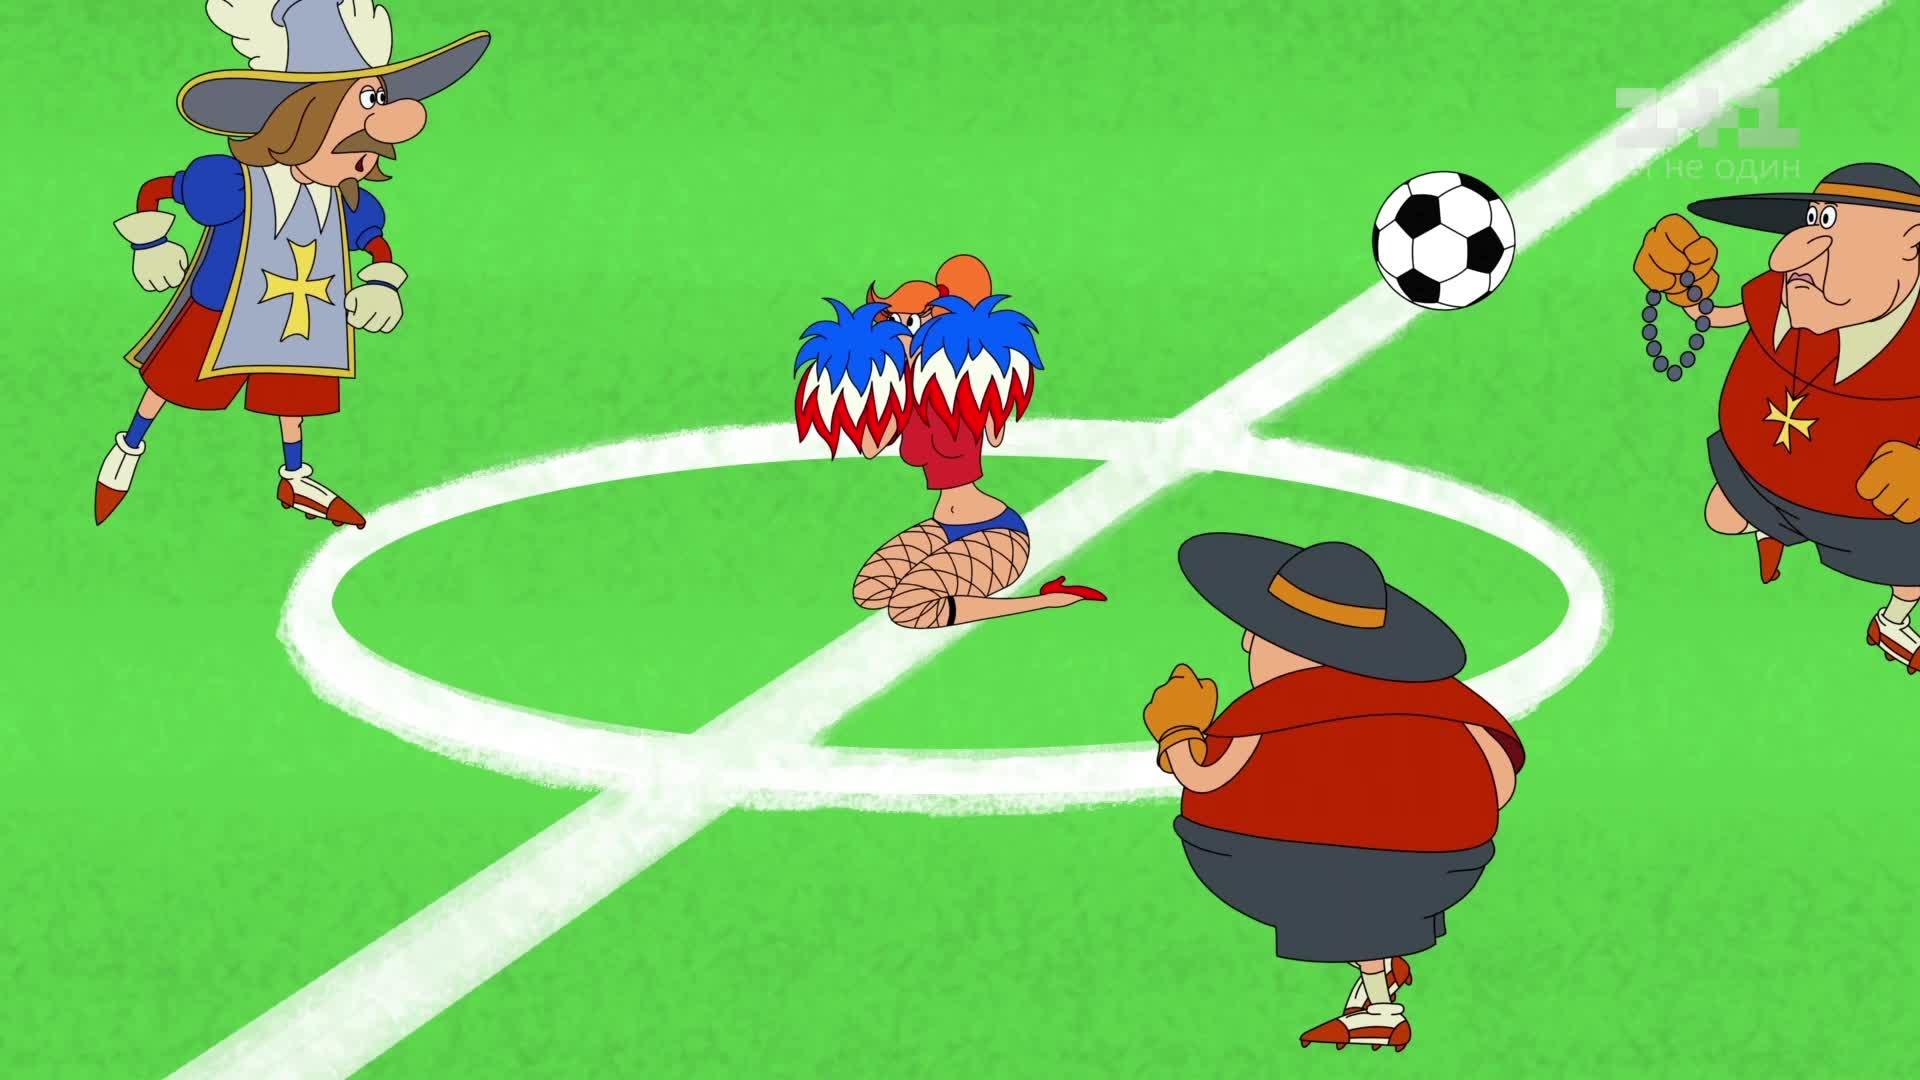 футбол 1: Козаки. Футбол 1 сезон 1 серія онлайн на 1+1 Video